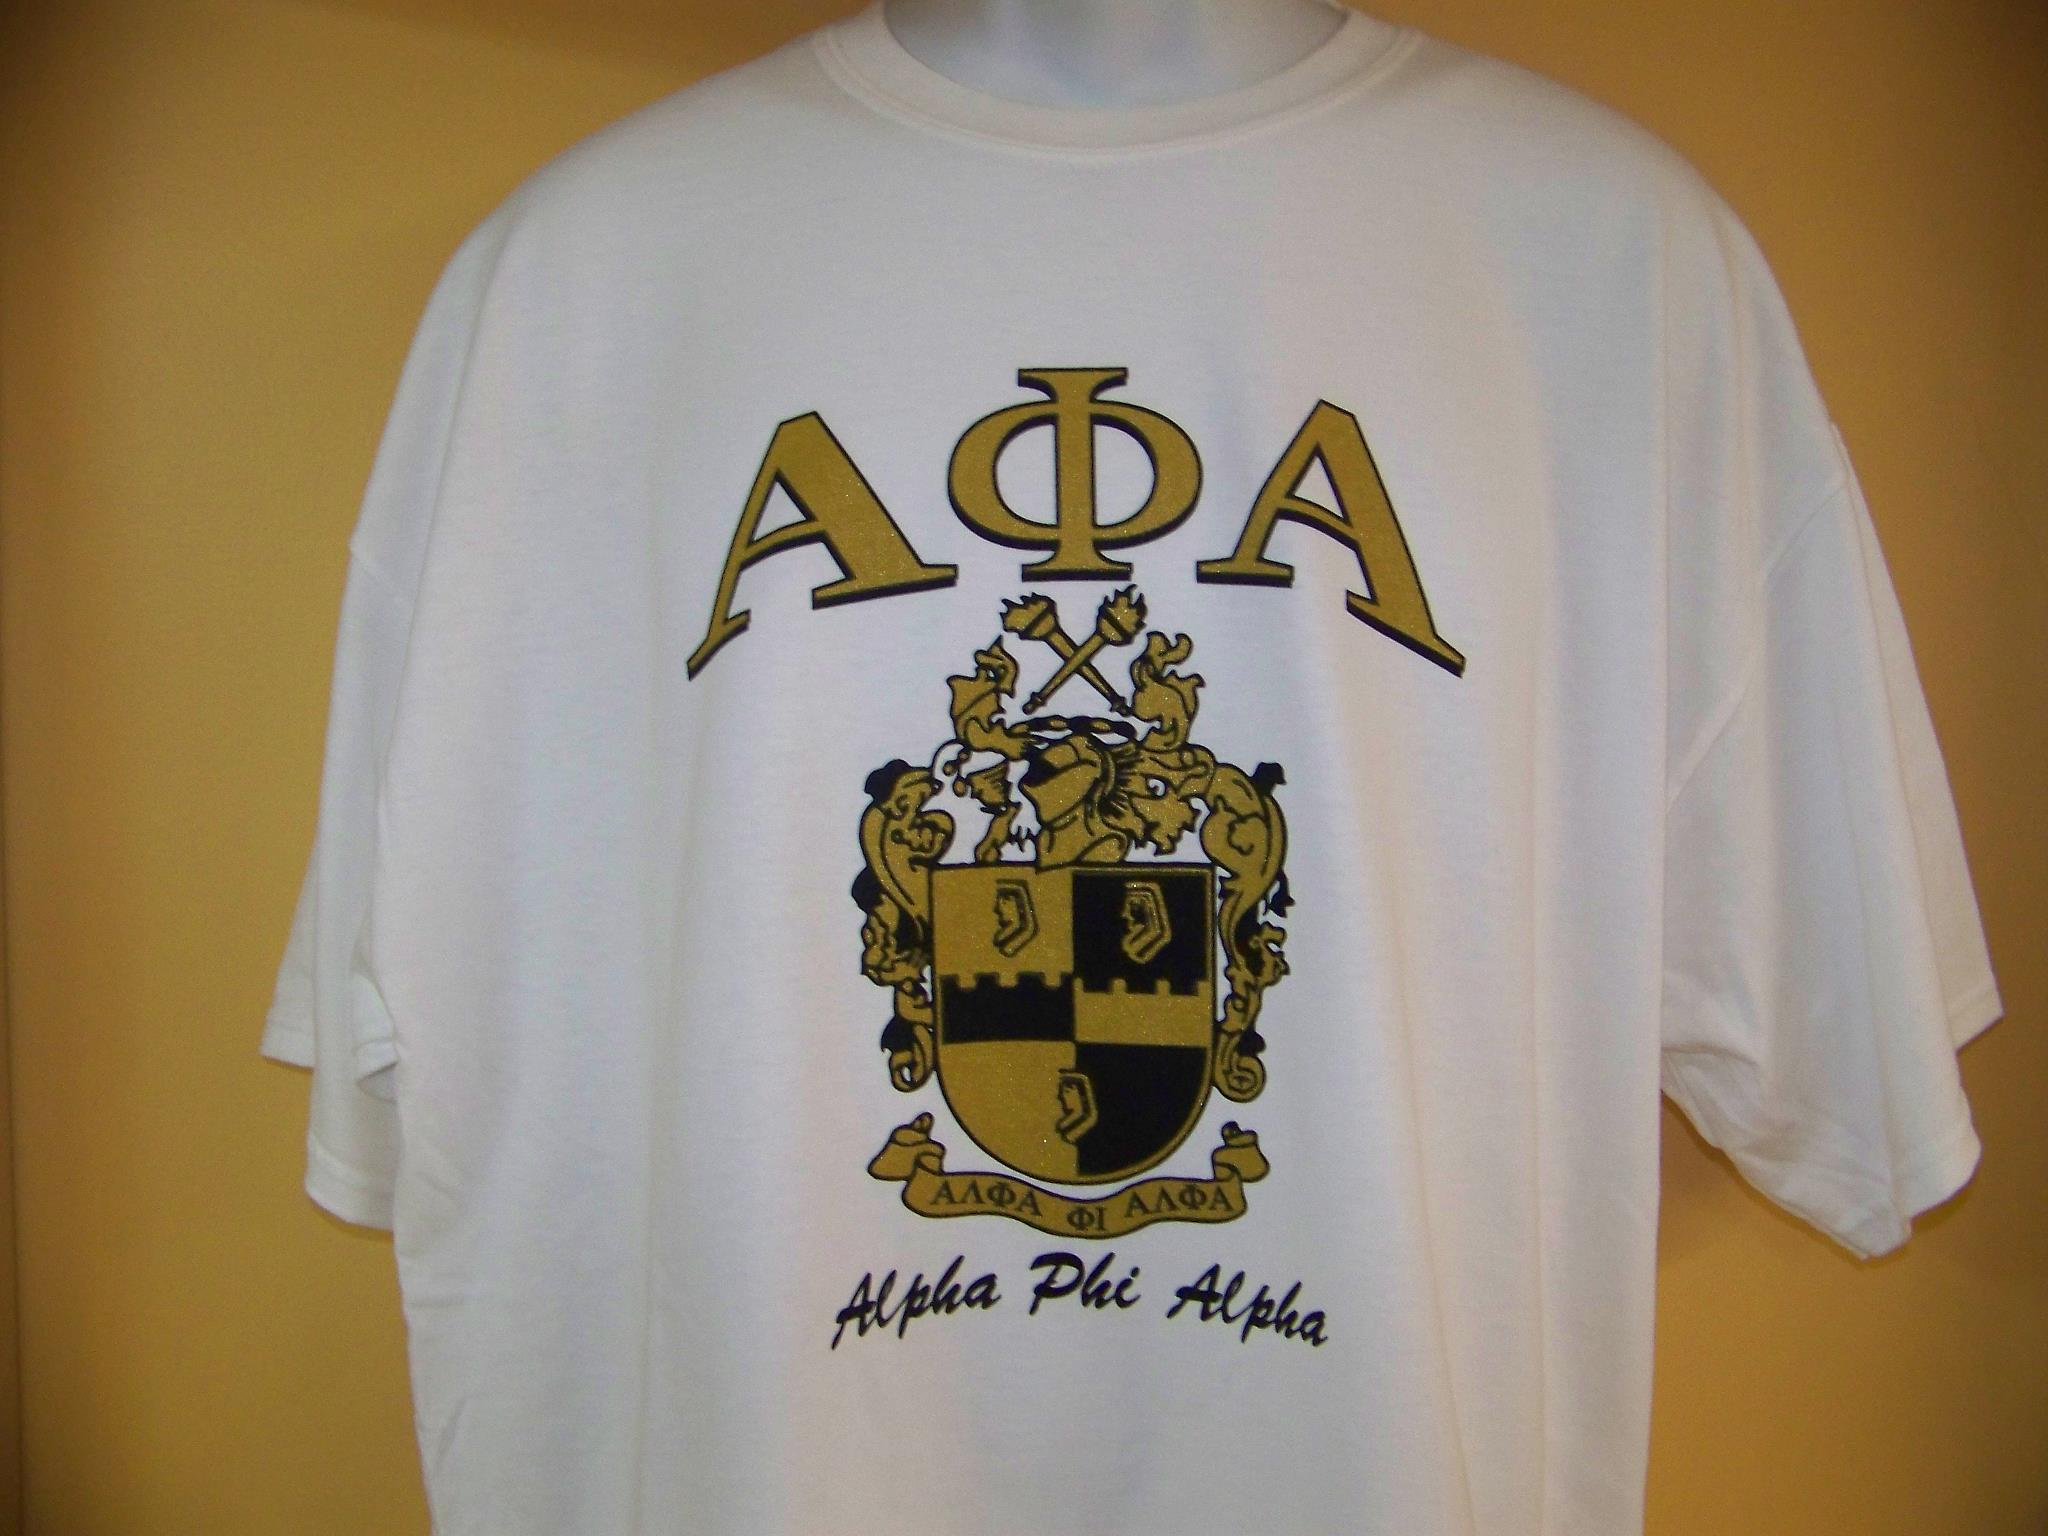 Storenvy coupon: Fraternity - Alpha Phi Alpha Crest Emblem White T-Shirt